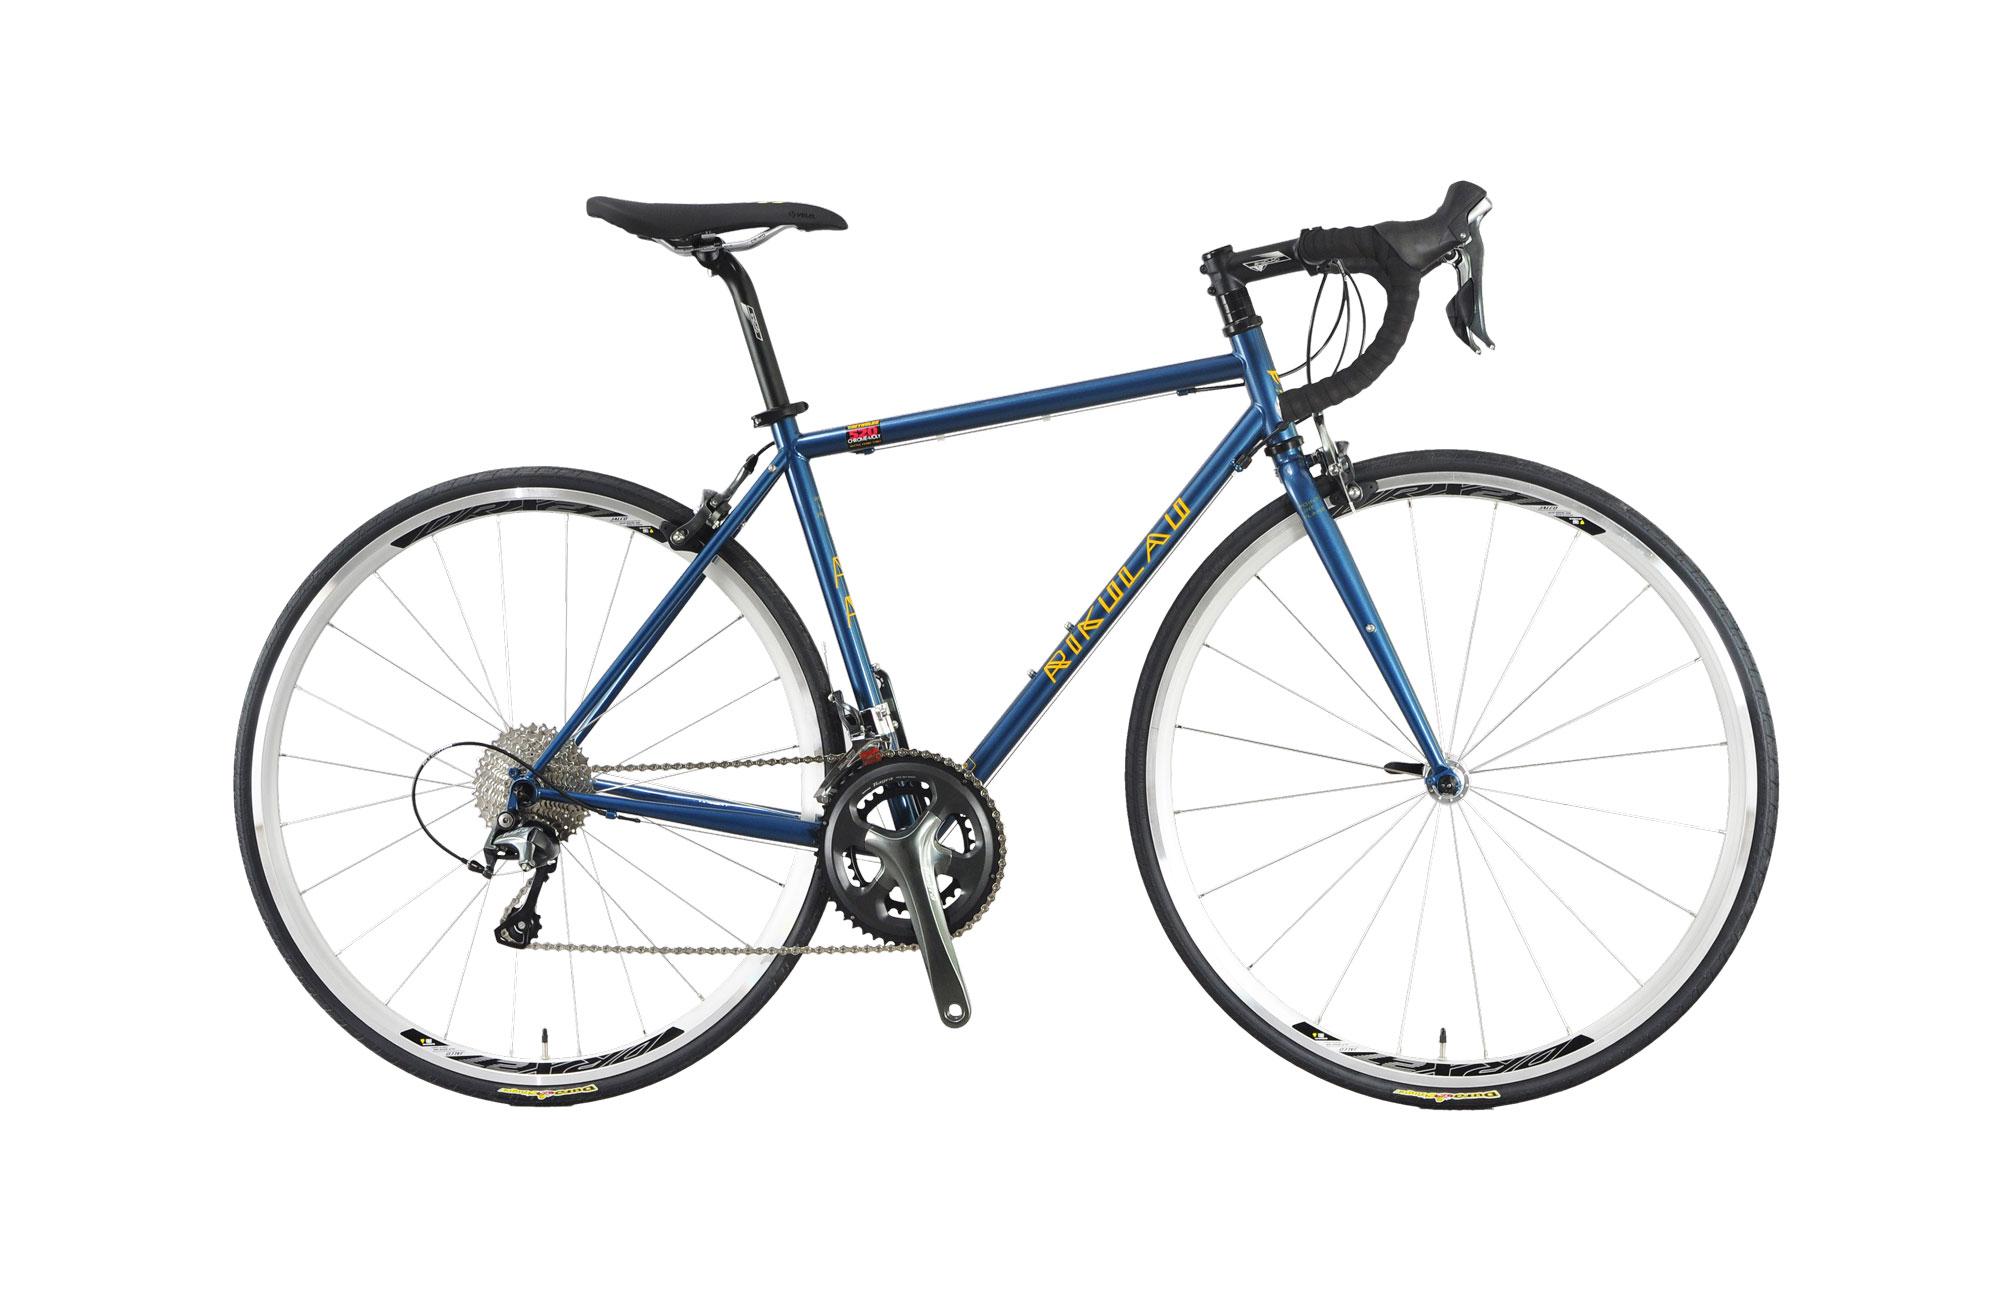 Road Bike - Audax 520 (chromoly)